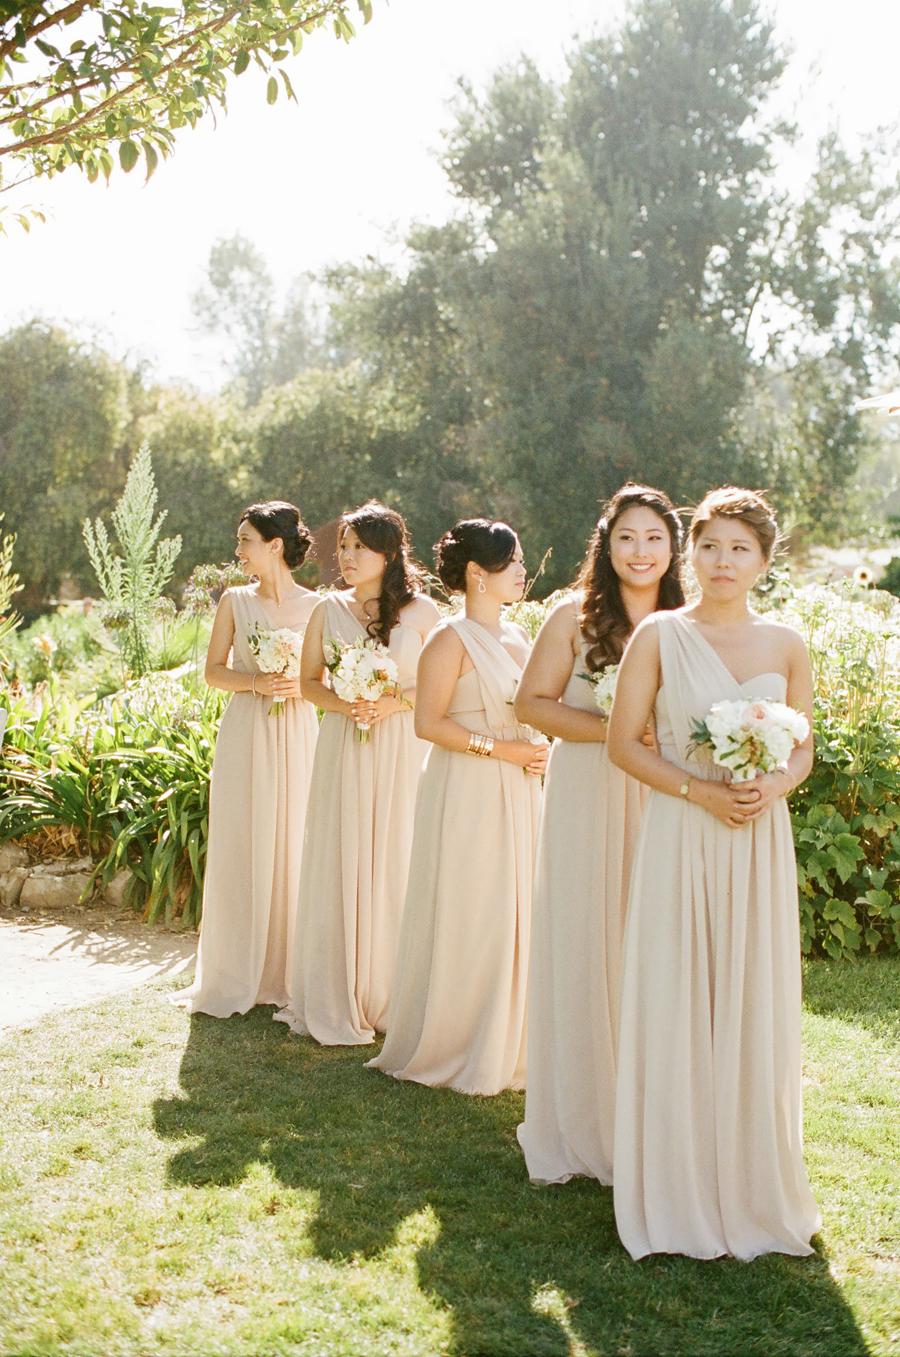 Champagne Bridesmaid Dresses Elizabeth Anne Designs The